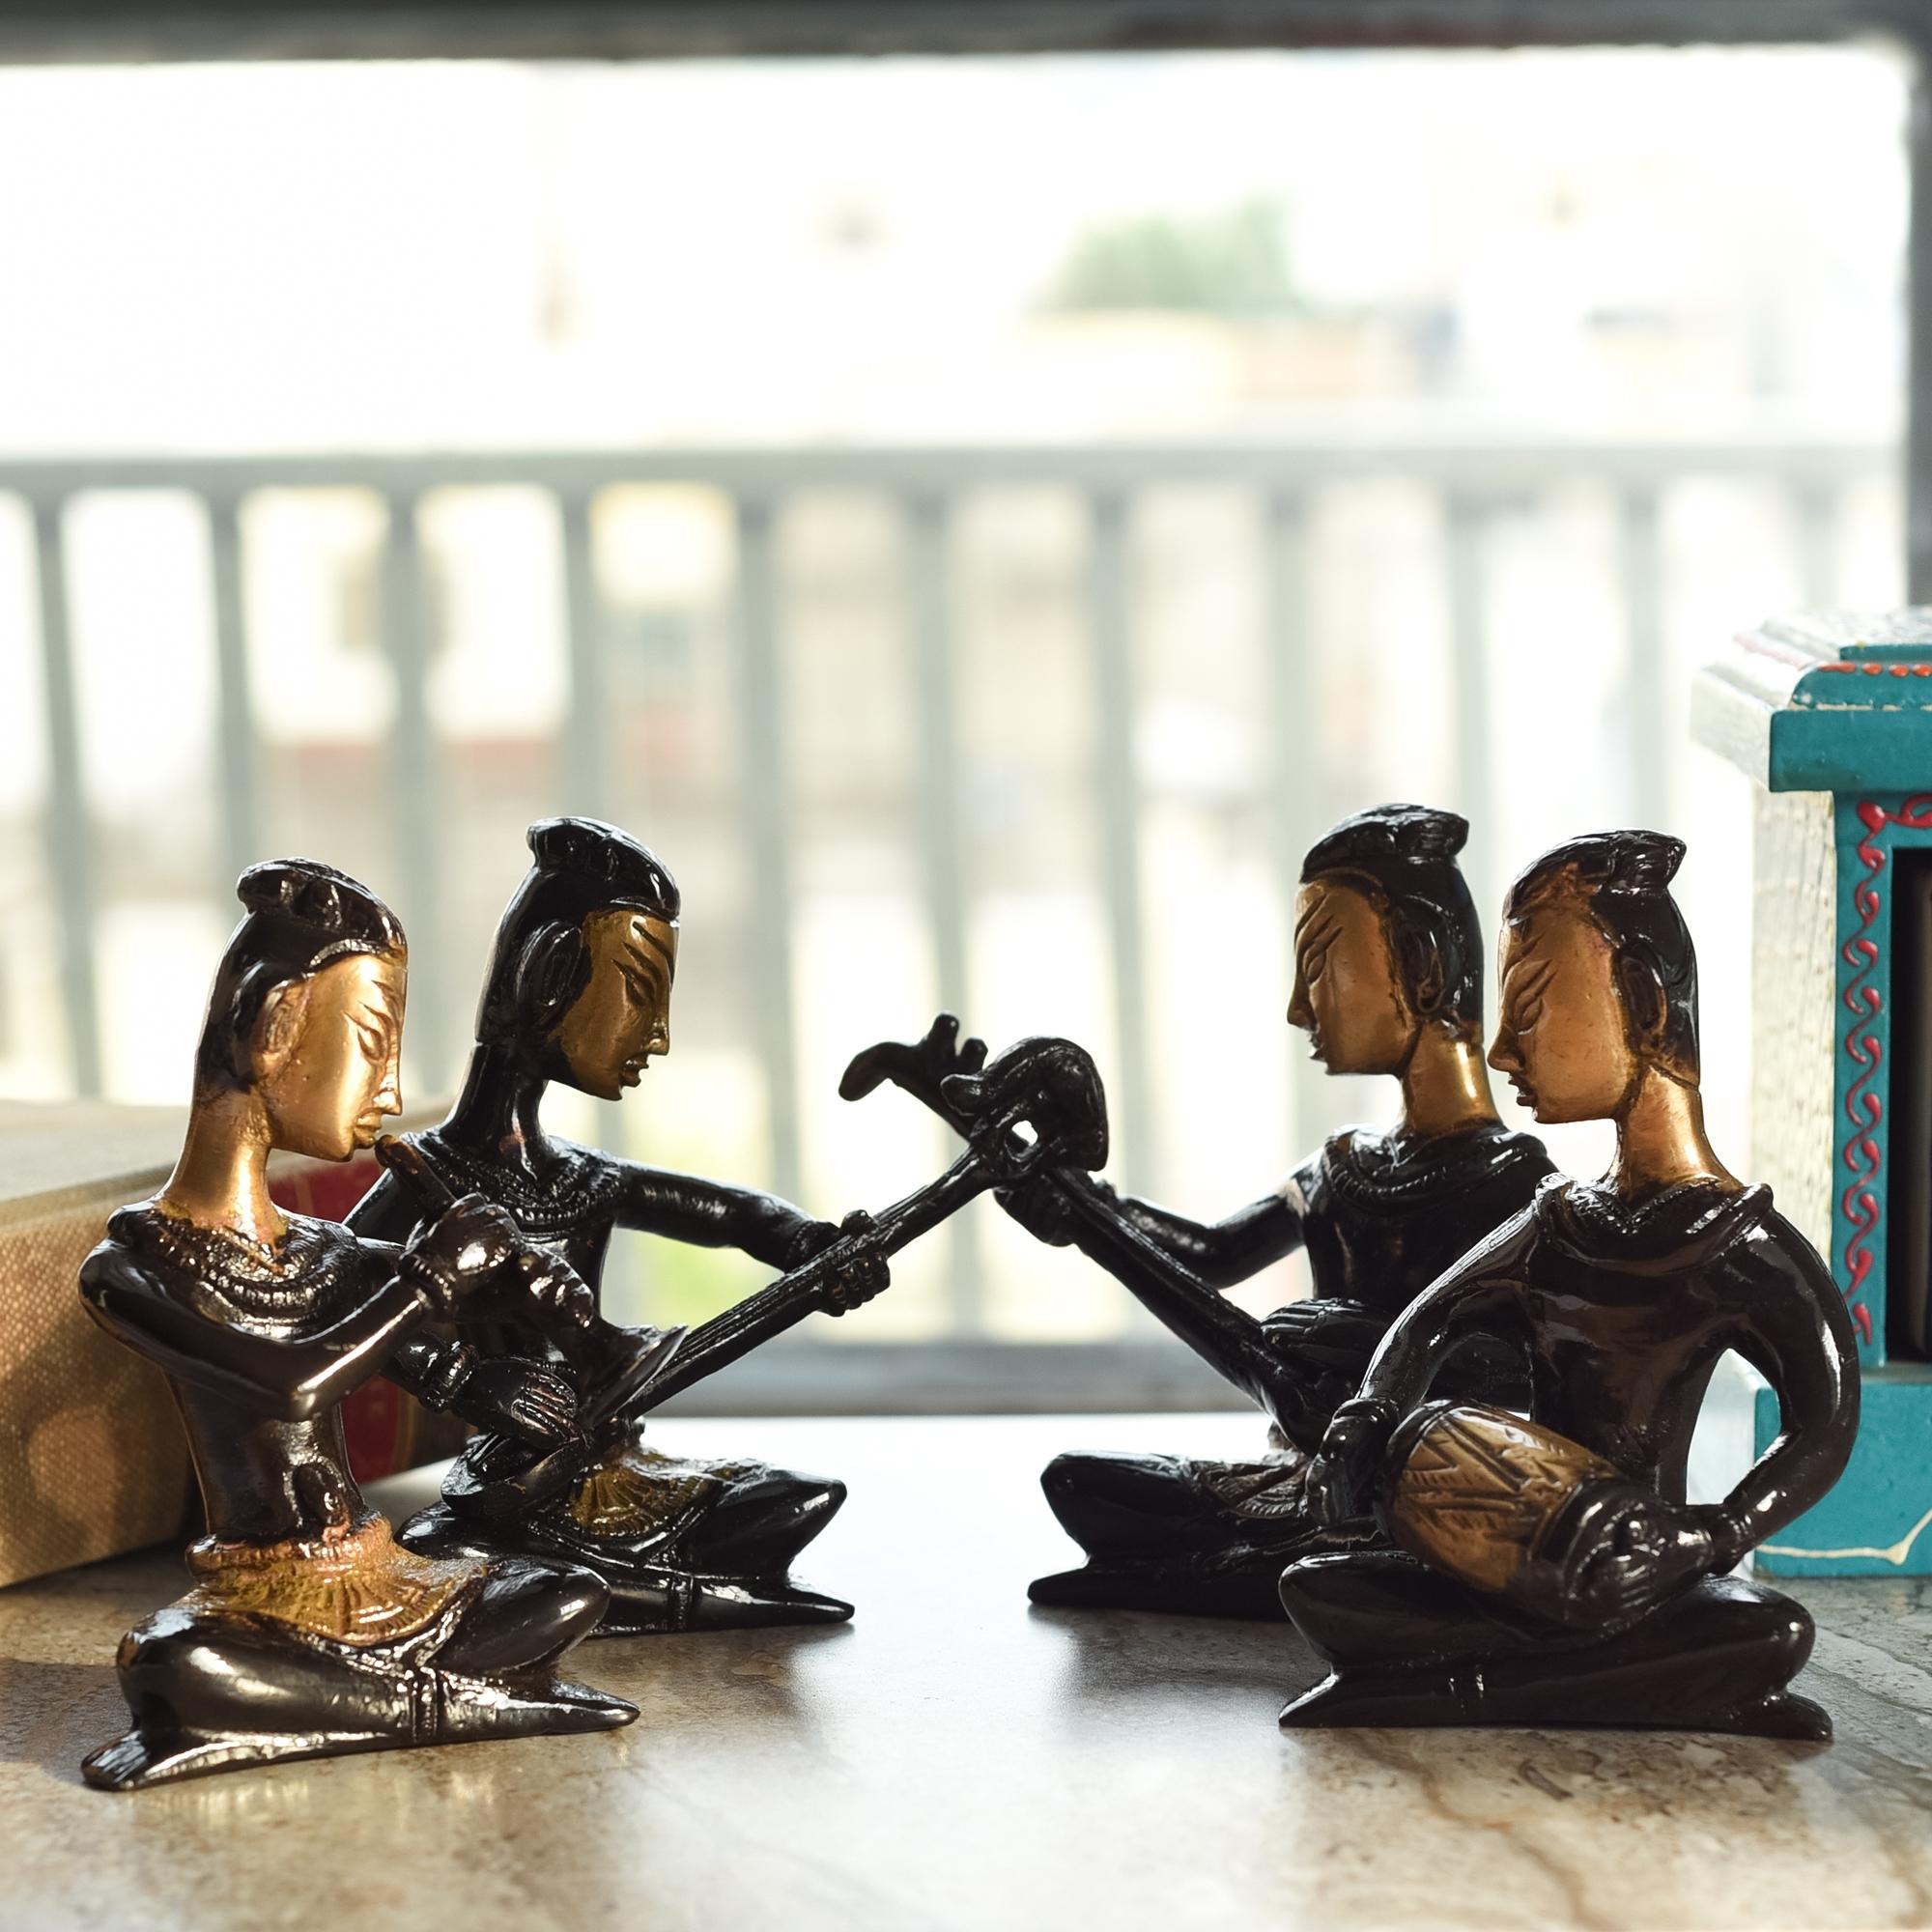 Set of 4 Brass Musical Ladies Decorative Antique Showpiece Indian Home Decor